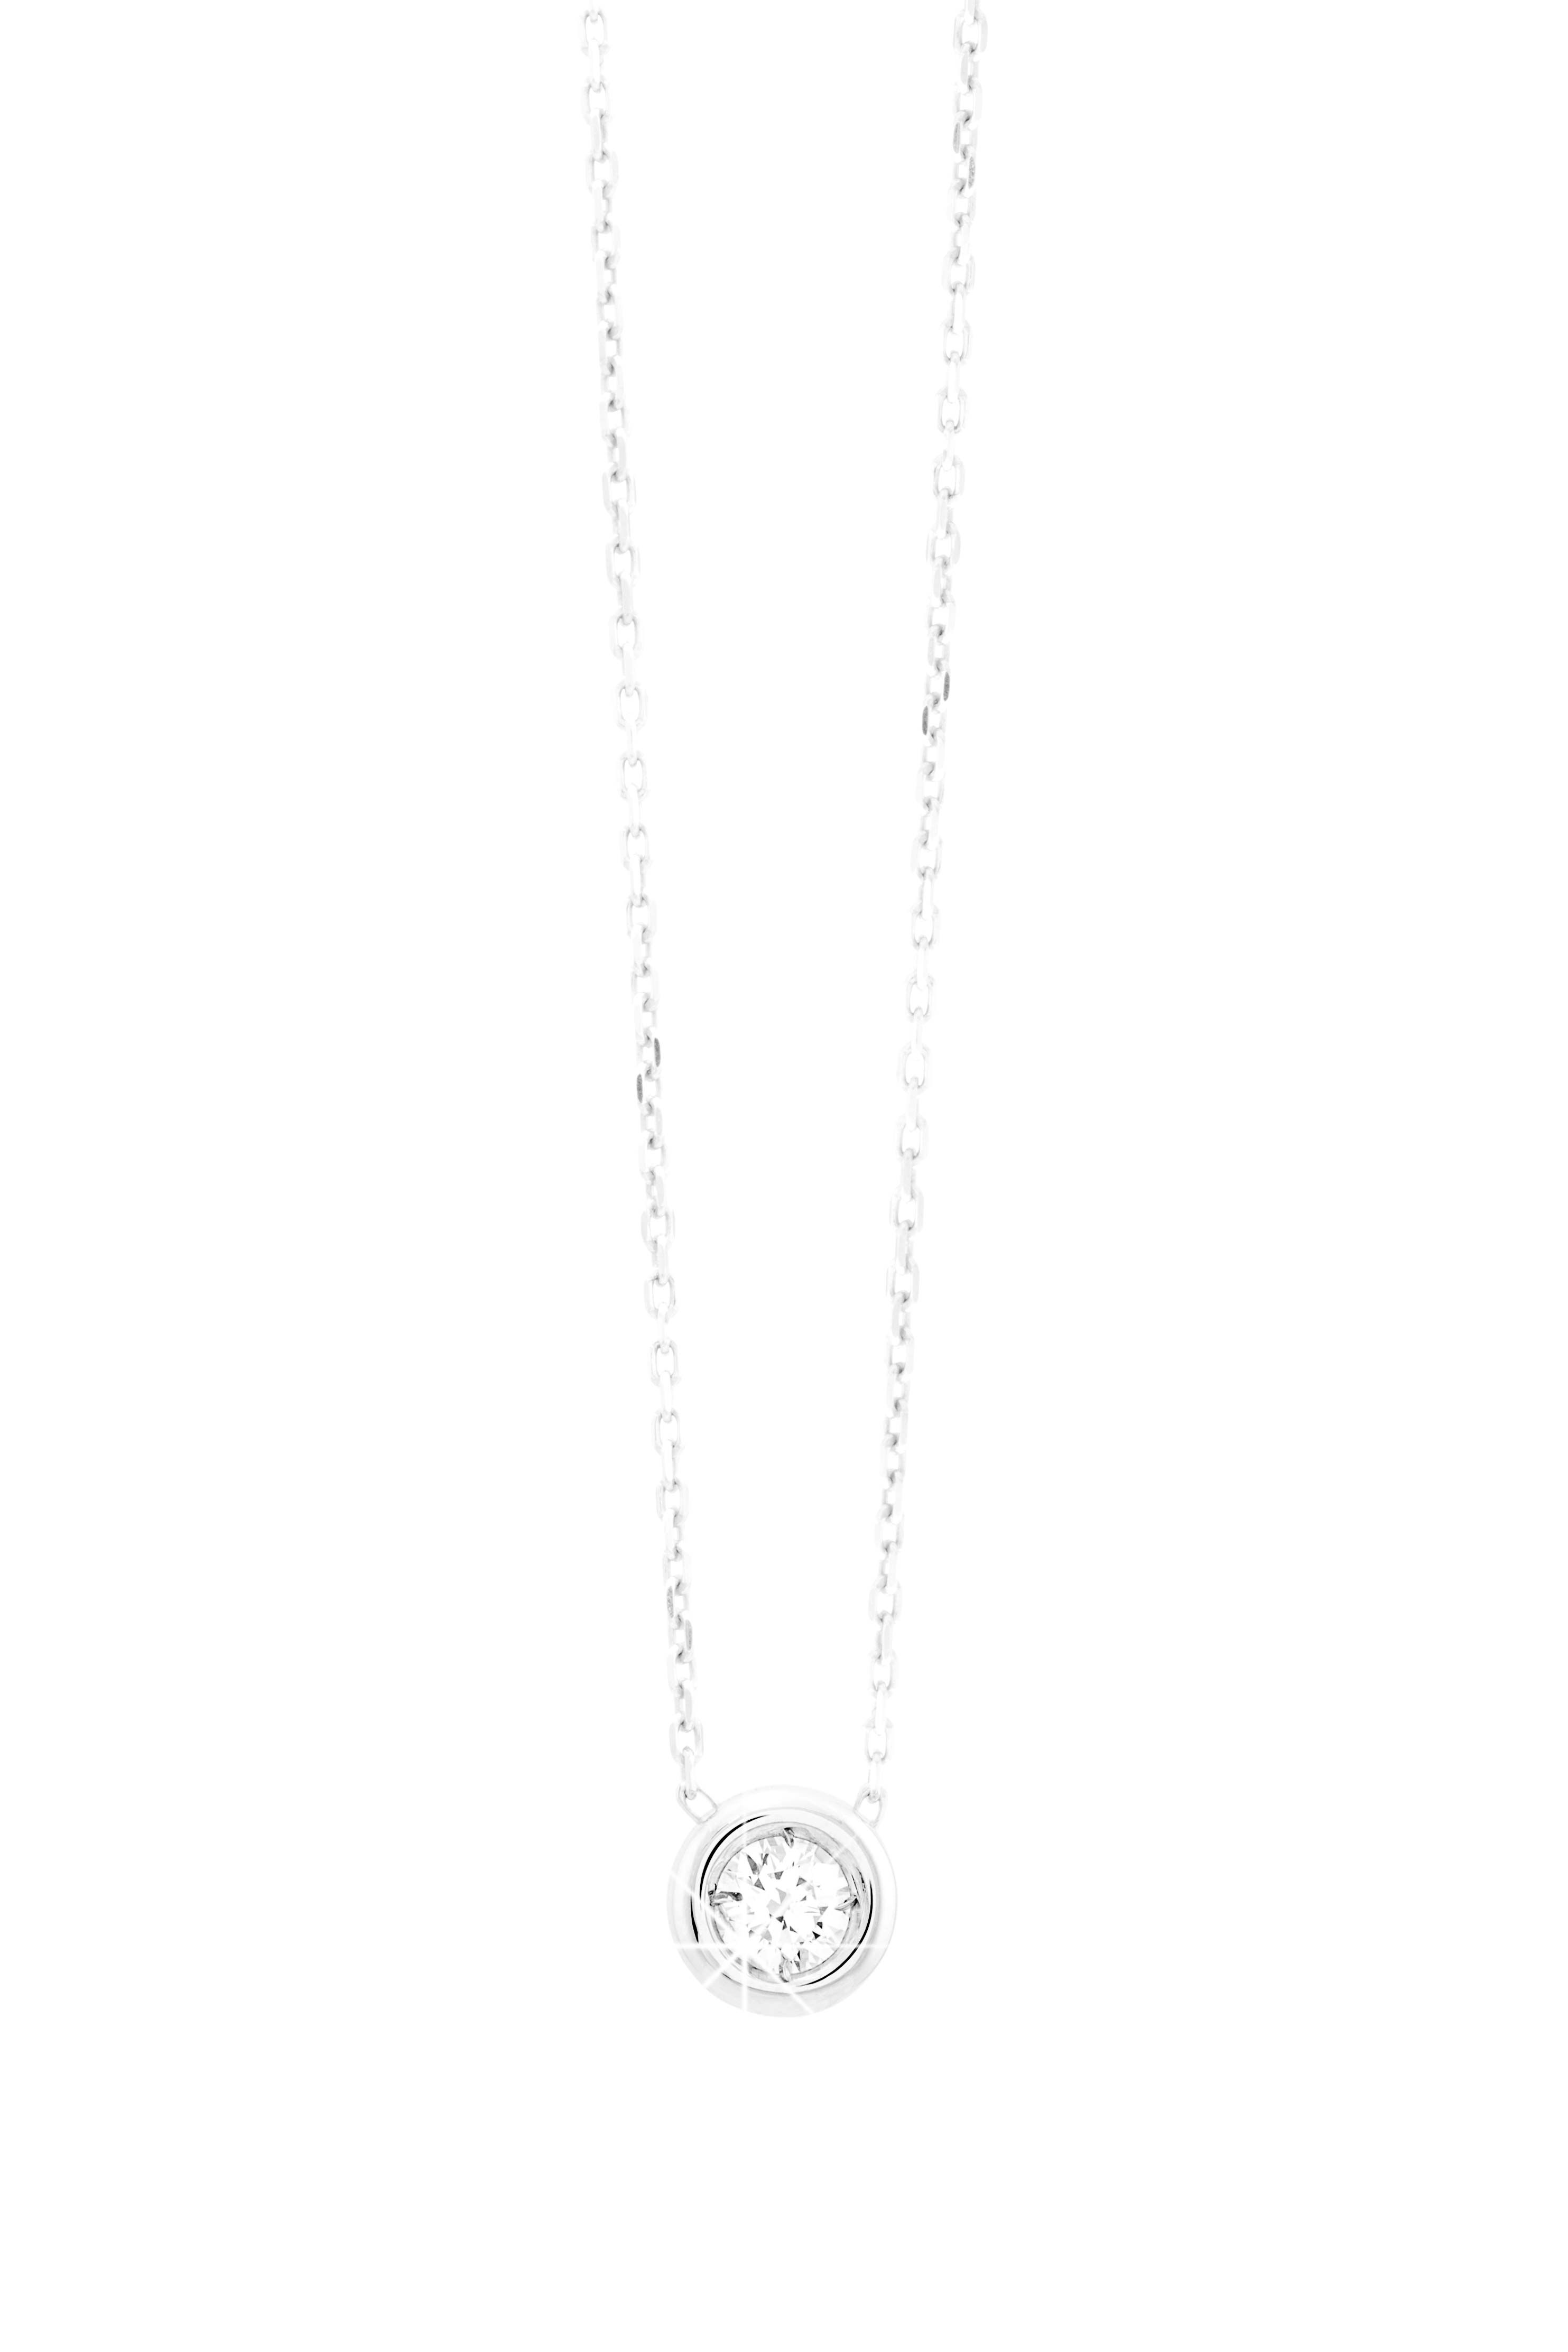 13a0a1c0862d8 Collier en argent massif et oxyde de zirconium  collier  mode  diamantor   bijoux